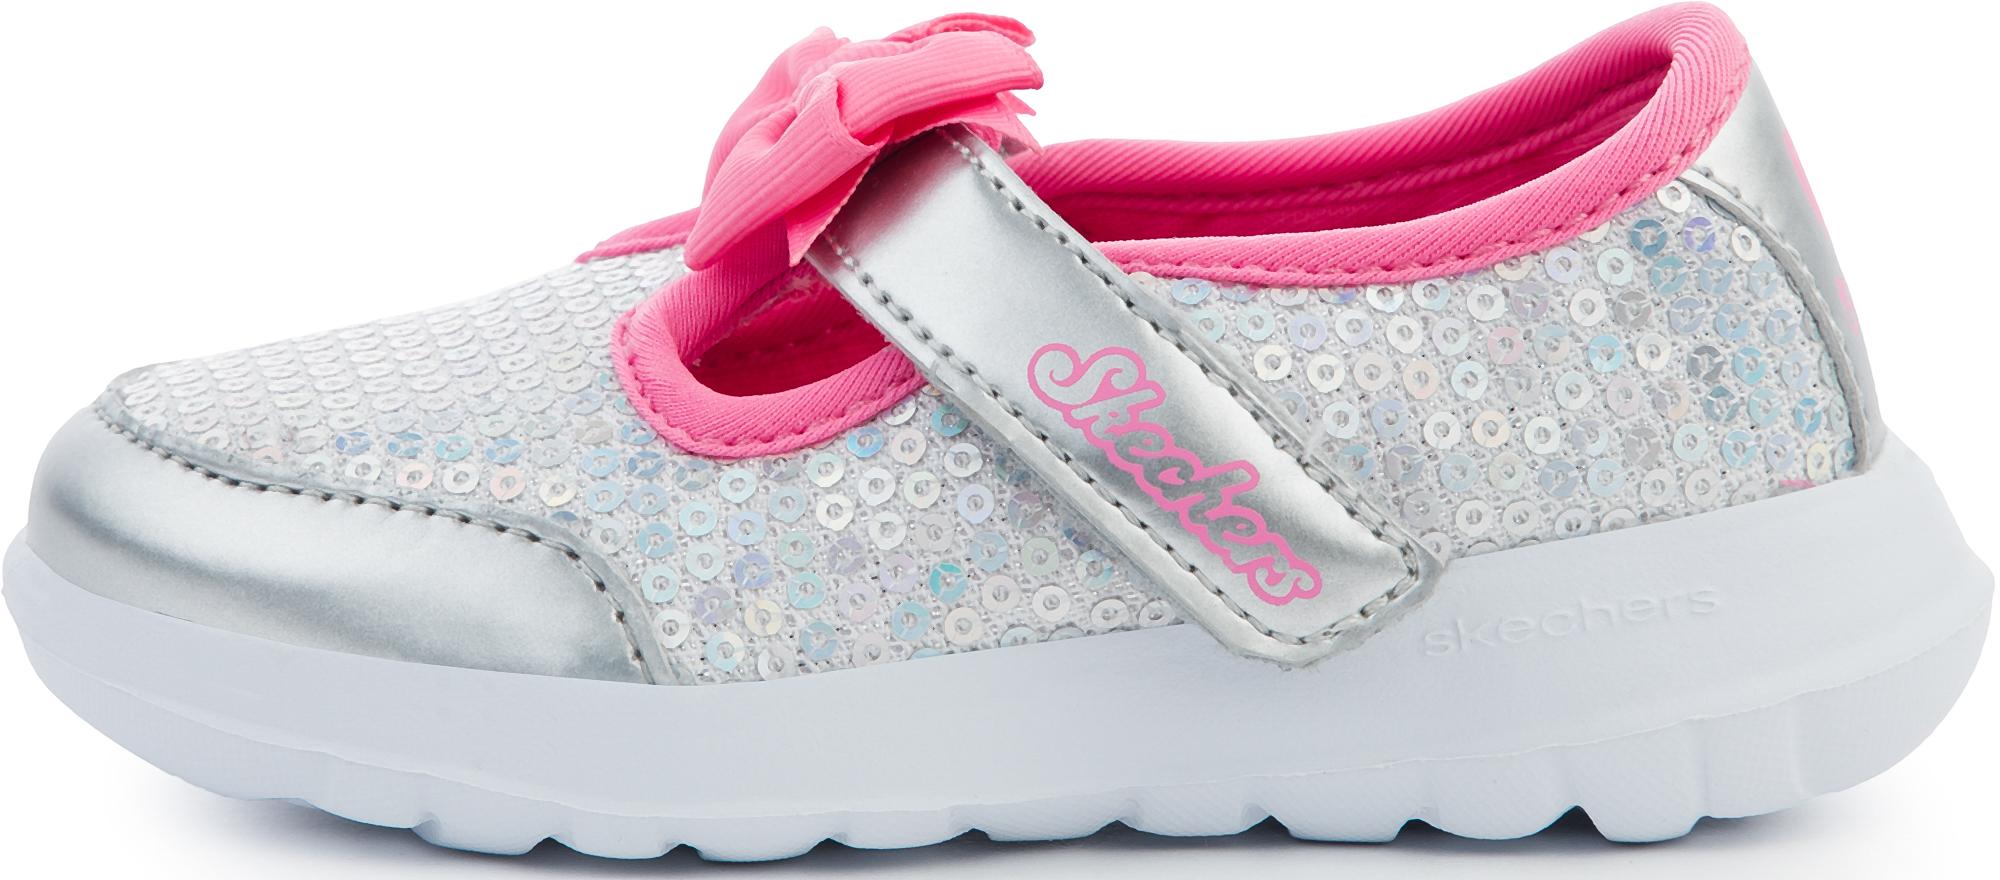 Skechers Кроссовки для девочек Go Walk Joy-Flashy Darling, размер 25,5